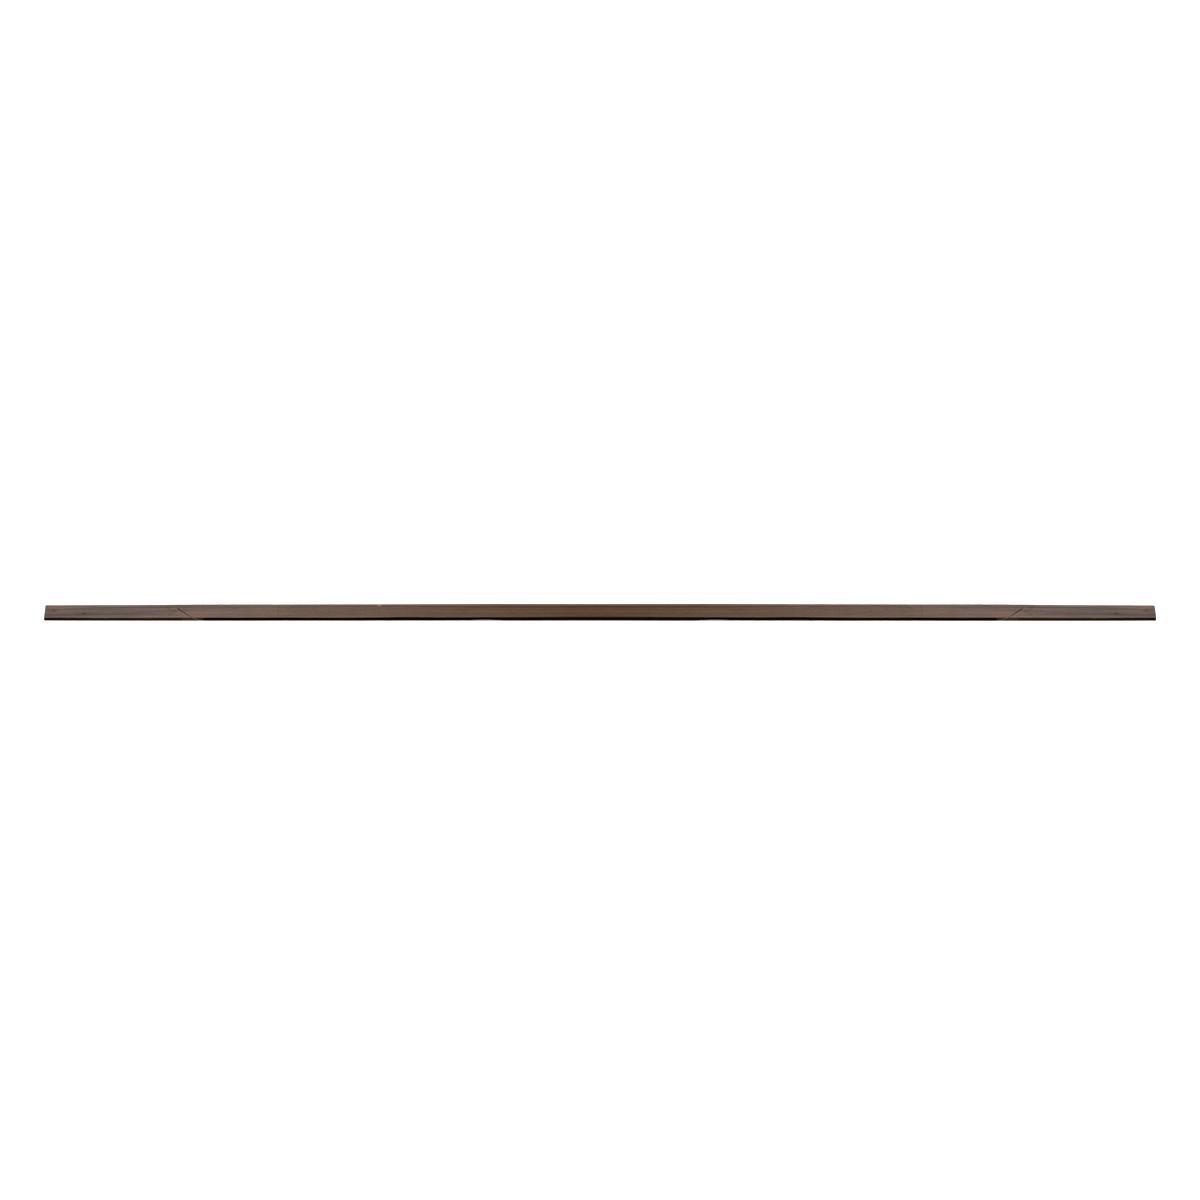 Perfil De Dilatación Manhattan Roble Glasgow Mate - 4.5X240 cm